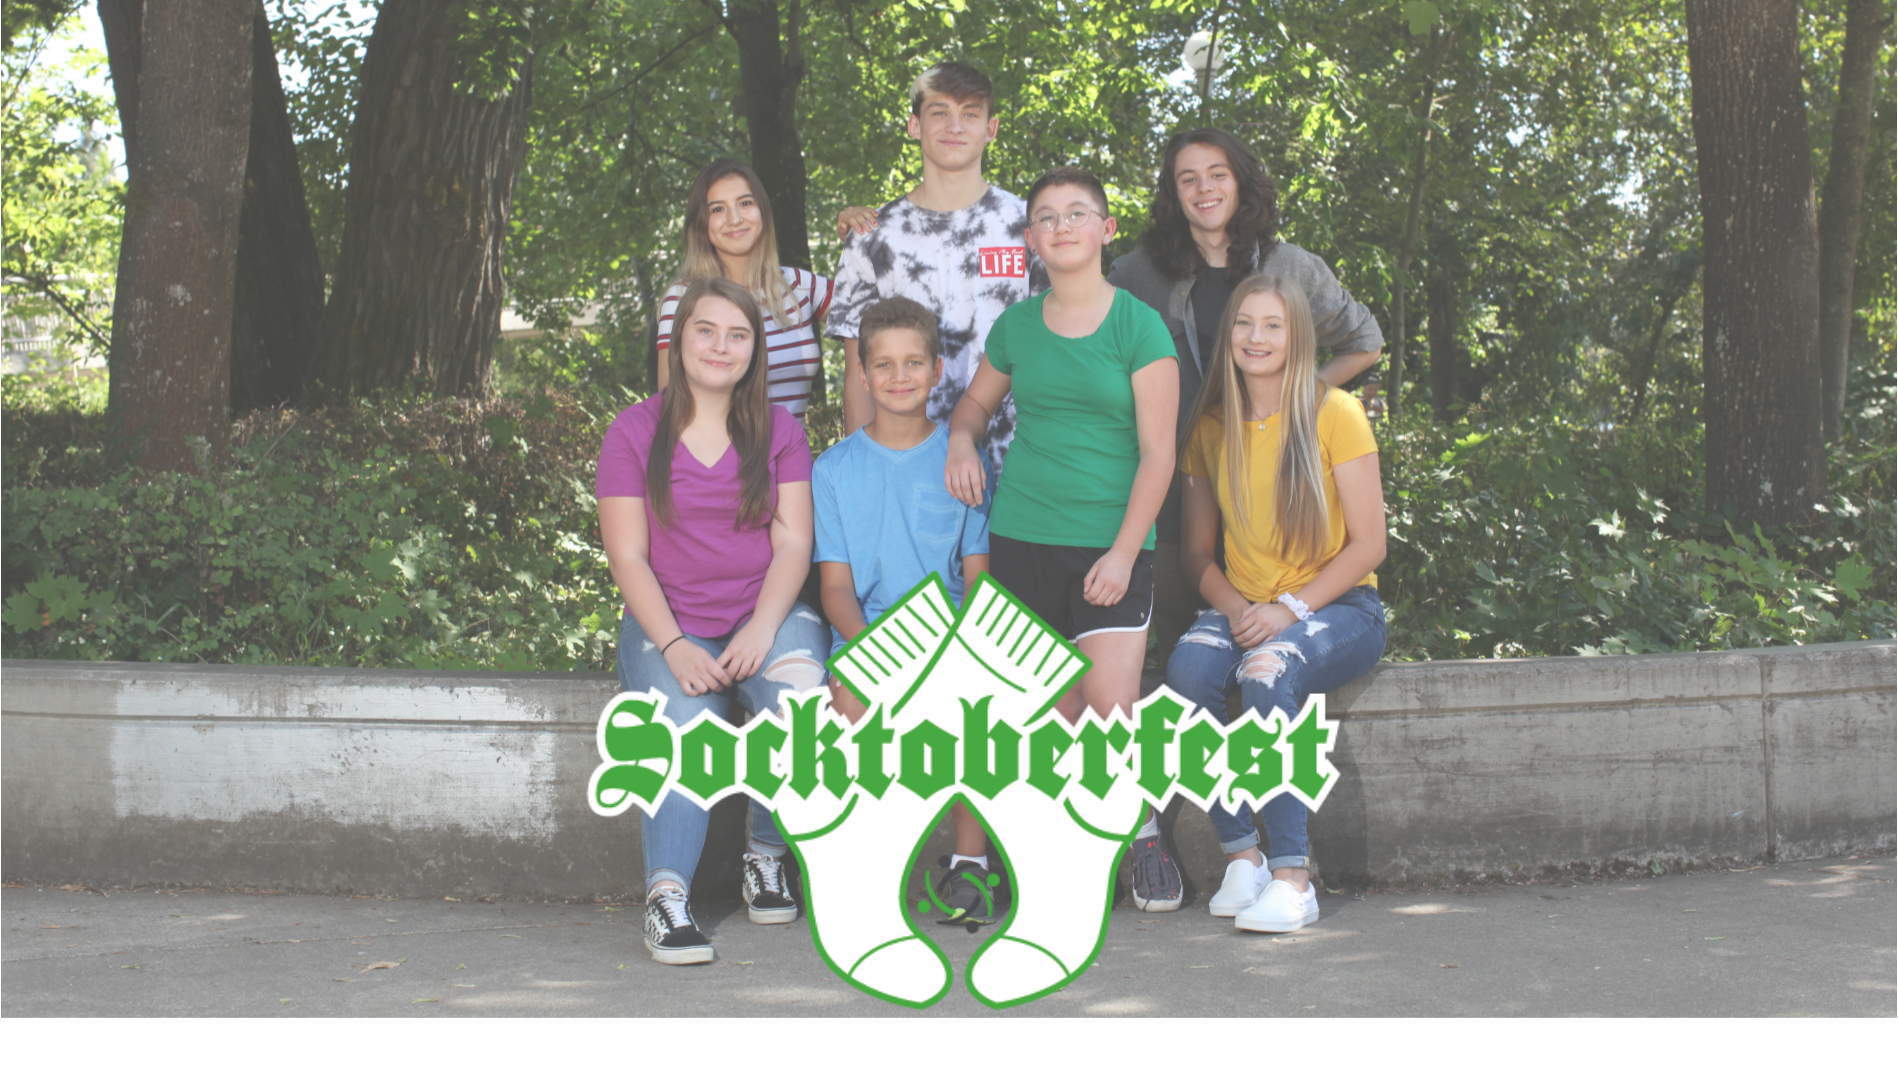 sOktoberfest website graphic.png